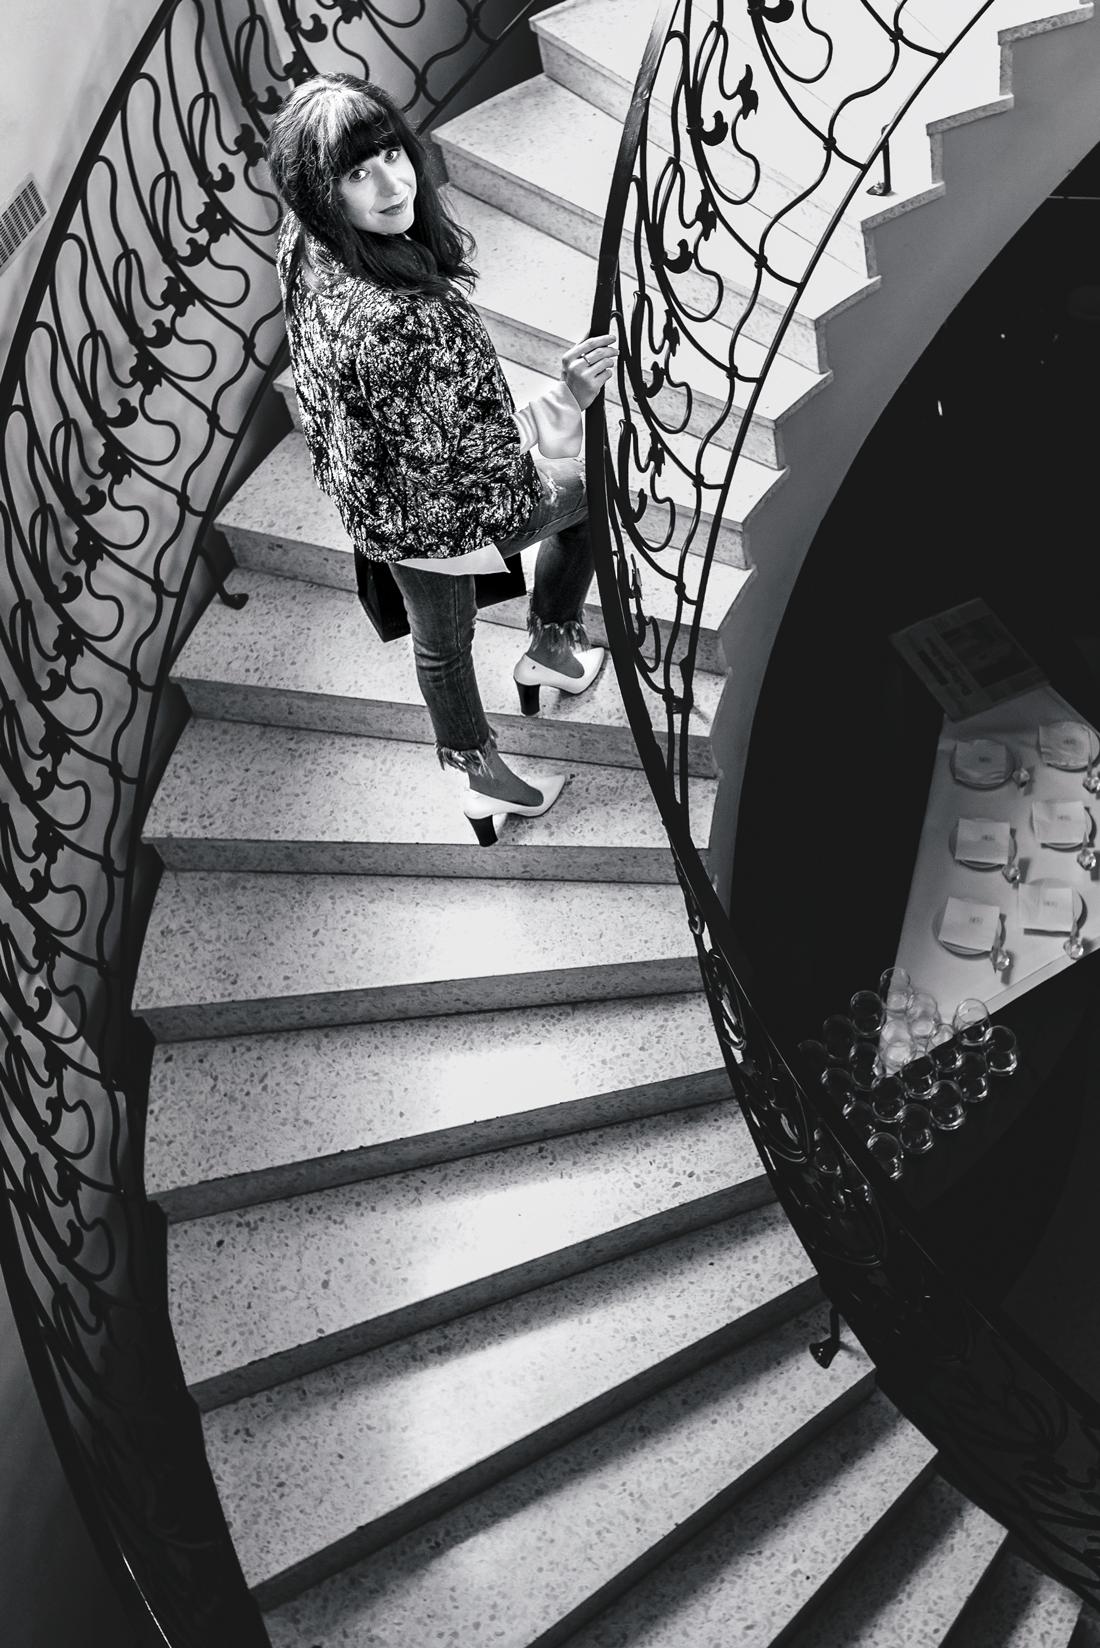 Podľa čoho spoznáte nákupnú maniačku_Katharine-fashion is beautiful_Blog 8_Tuliphousehotel_Džínsy Zara_Biele lodičky Kati_Okuliare Misteroptic_Katarína Jakubčová_Fashion blogger